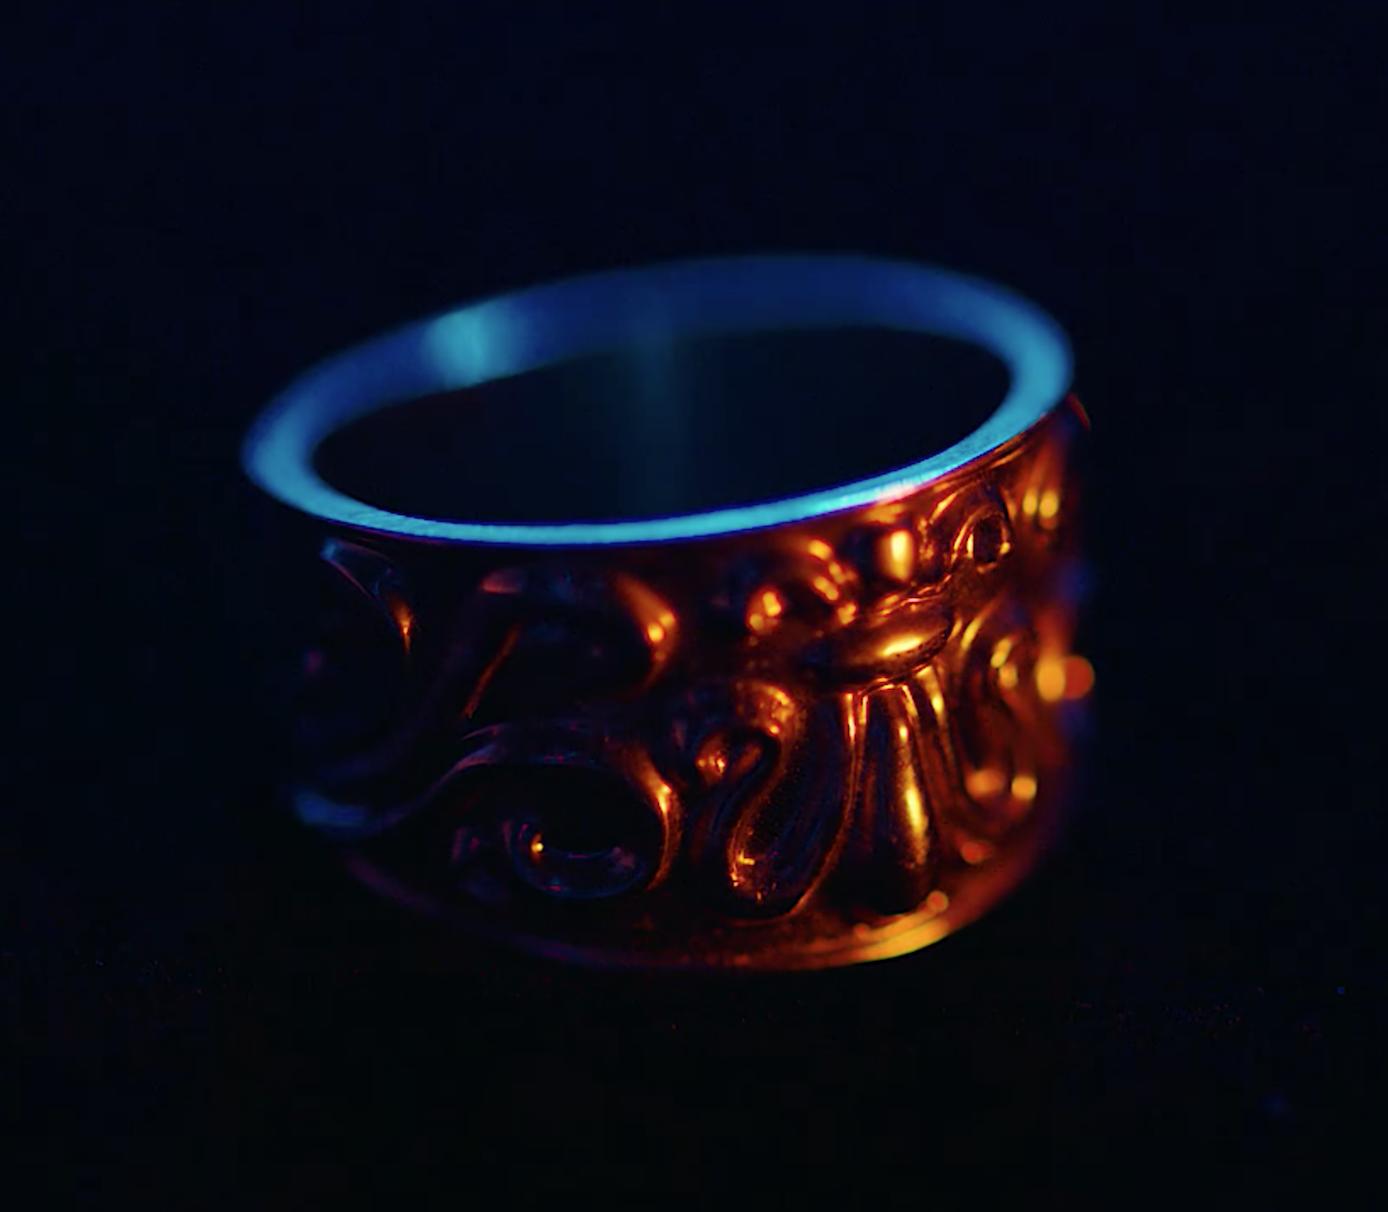 Capture d'écran 2017-02-07 à 11.52.43.png Download free STL file Ring - Vikings 3D Prophecy - Season 4, Episode 18 - Revenge • 3D printer design, 3DBROOKLYN